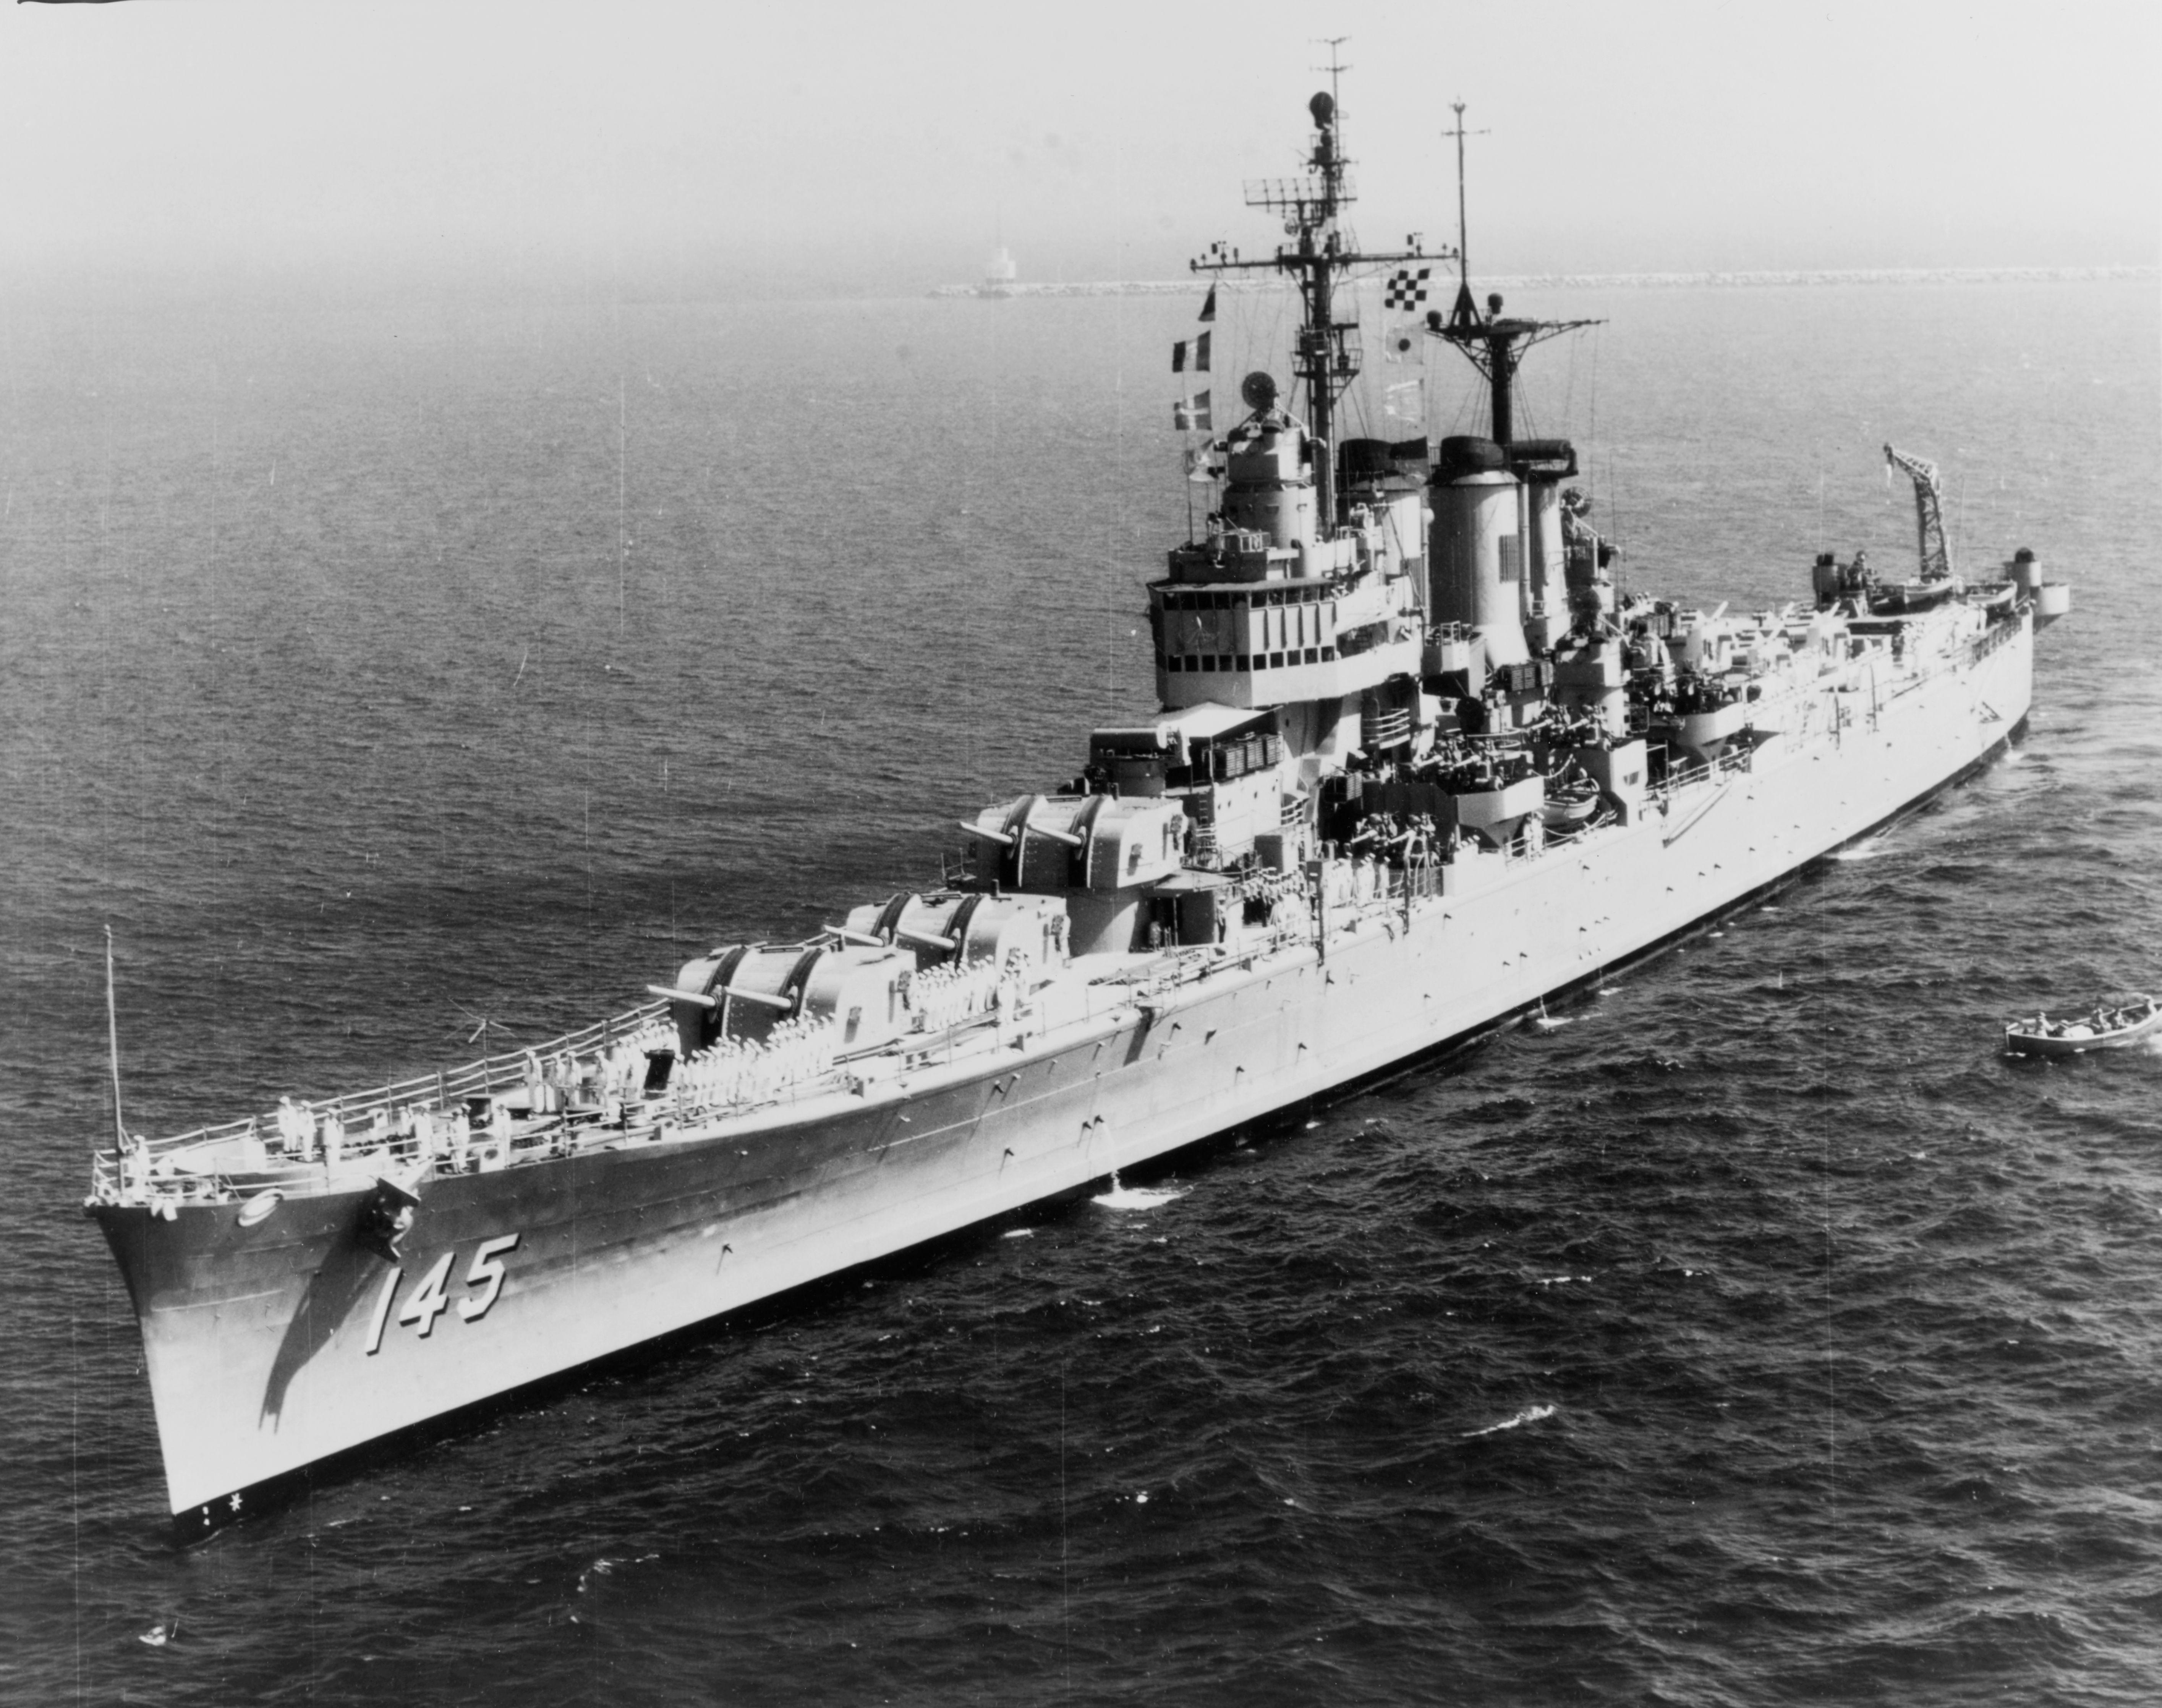 1950s Battleship